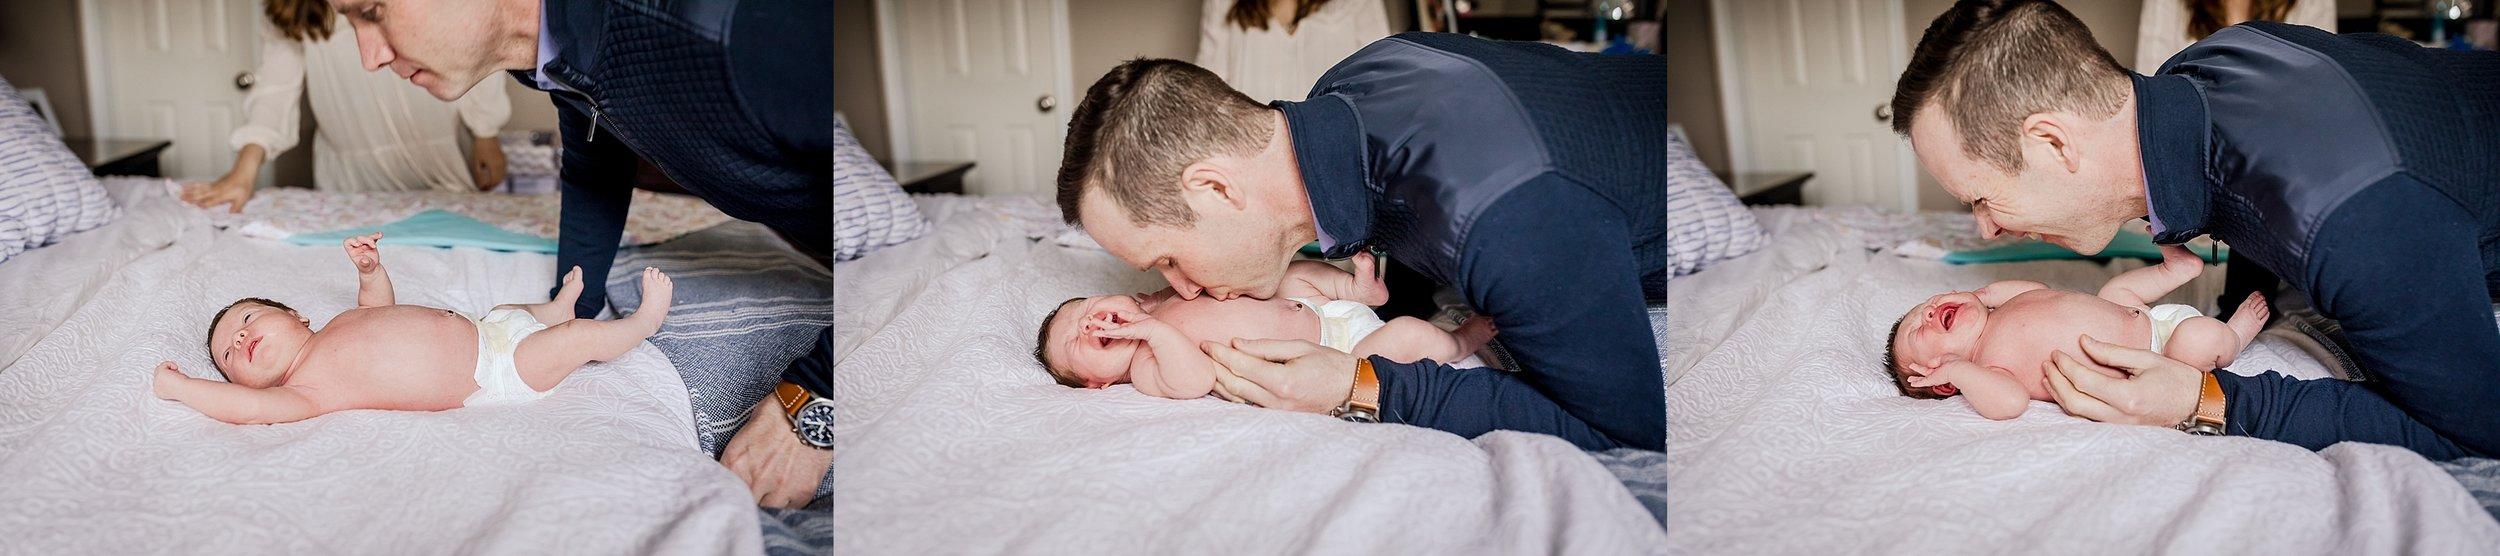 Lehigh-Valley-Newborn-Photographer_0020.jpg